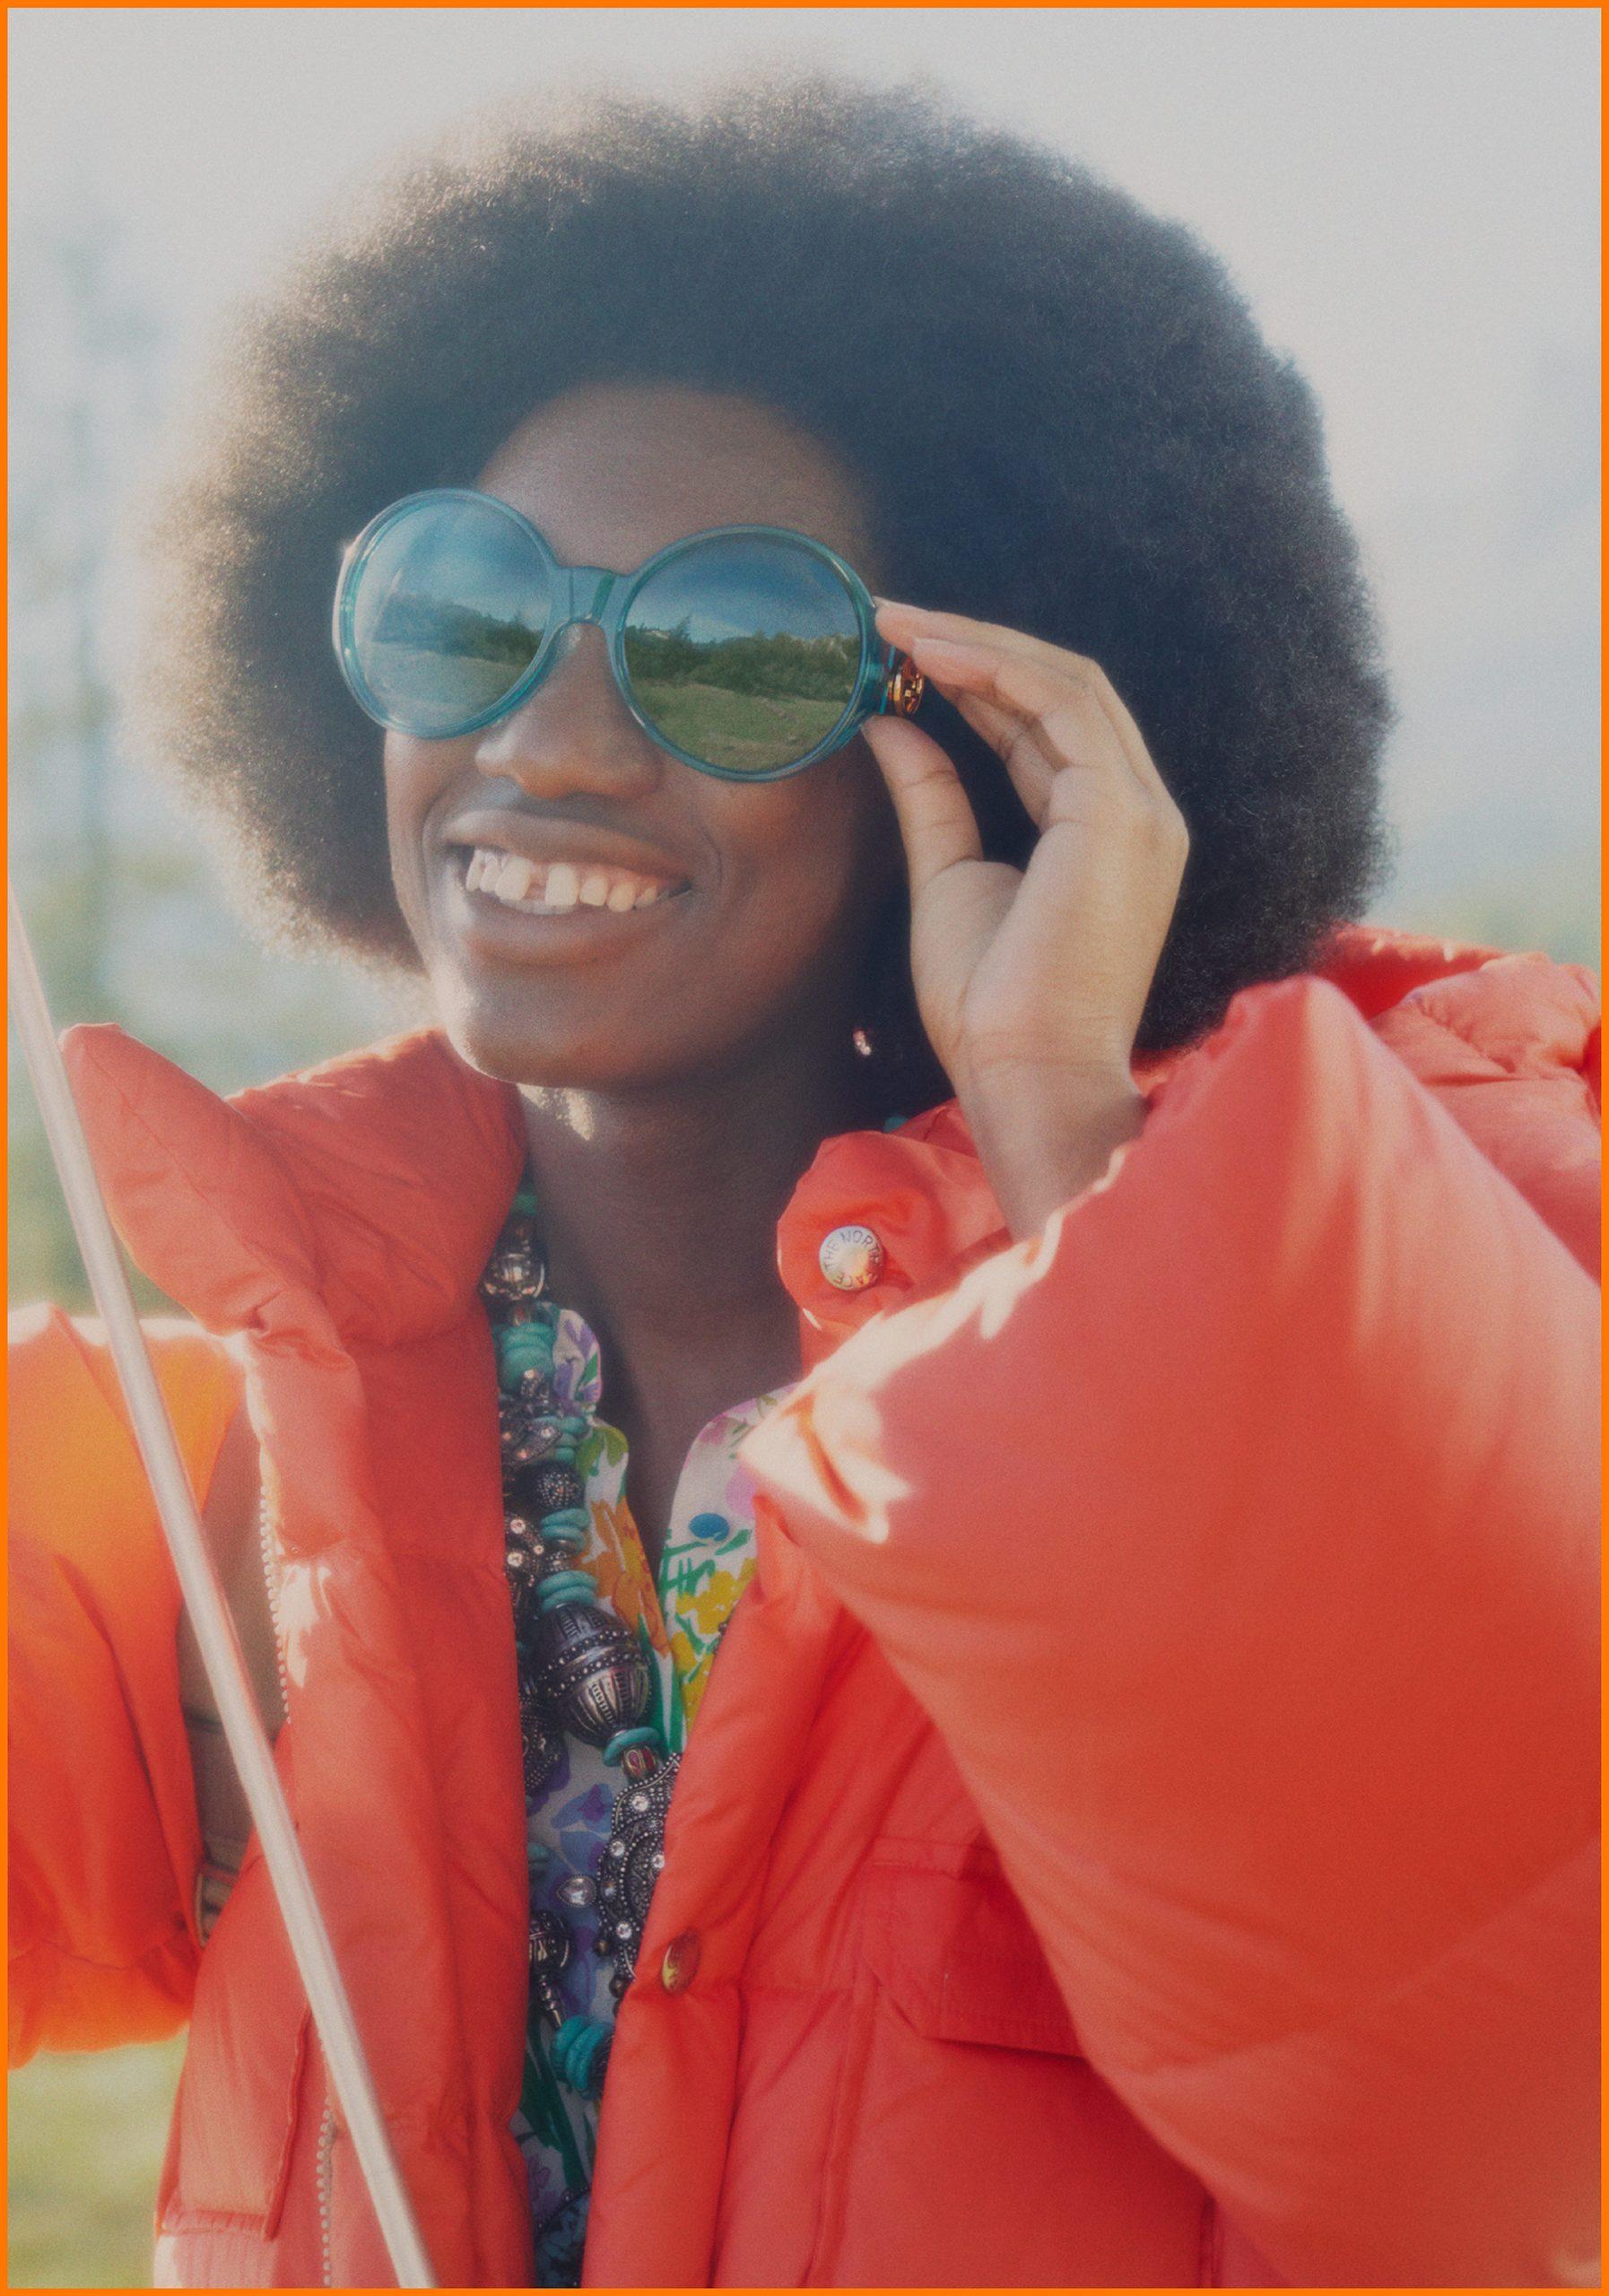 North Face x Gucci Spring 2021 Ad Campaign Film & Photos